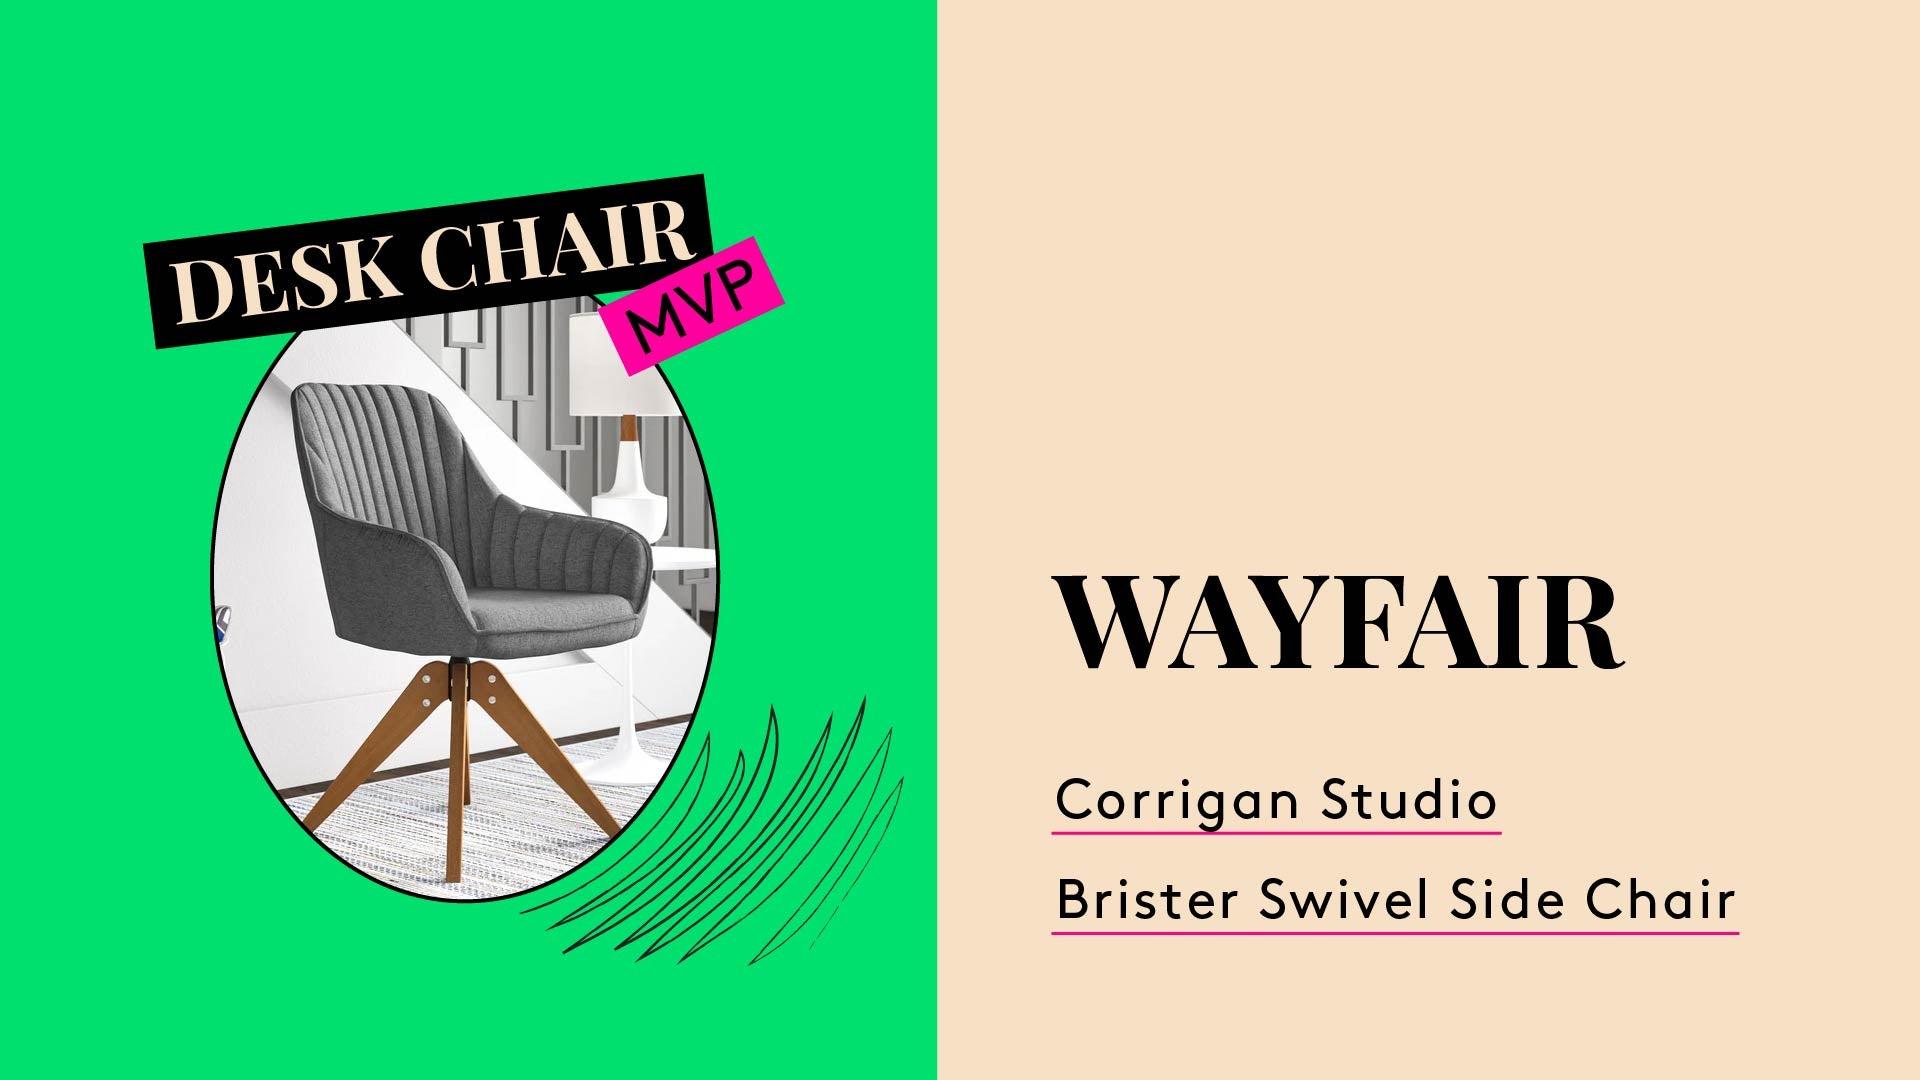 Chair MVP. This is a photo of the Wayfair Corrigan Studio Brister Swivel Chair.